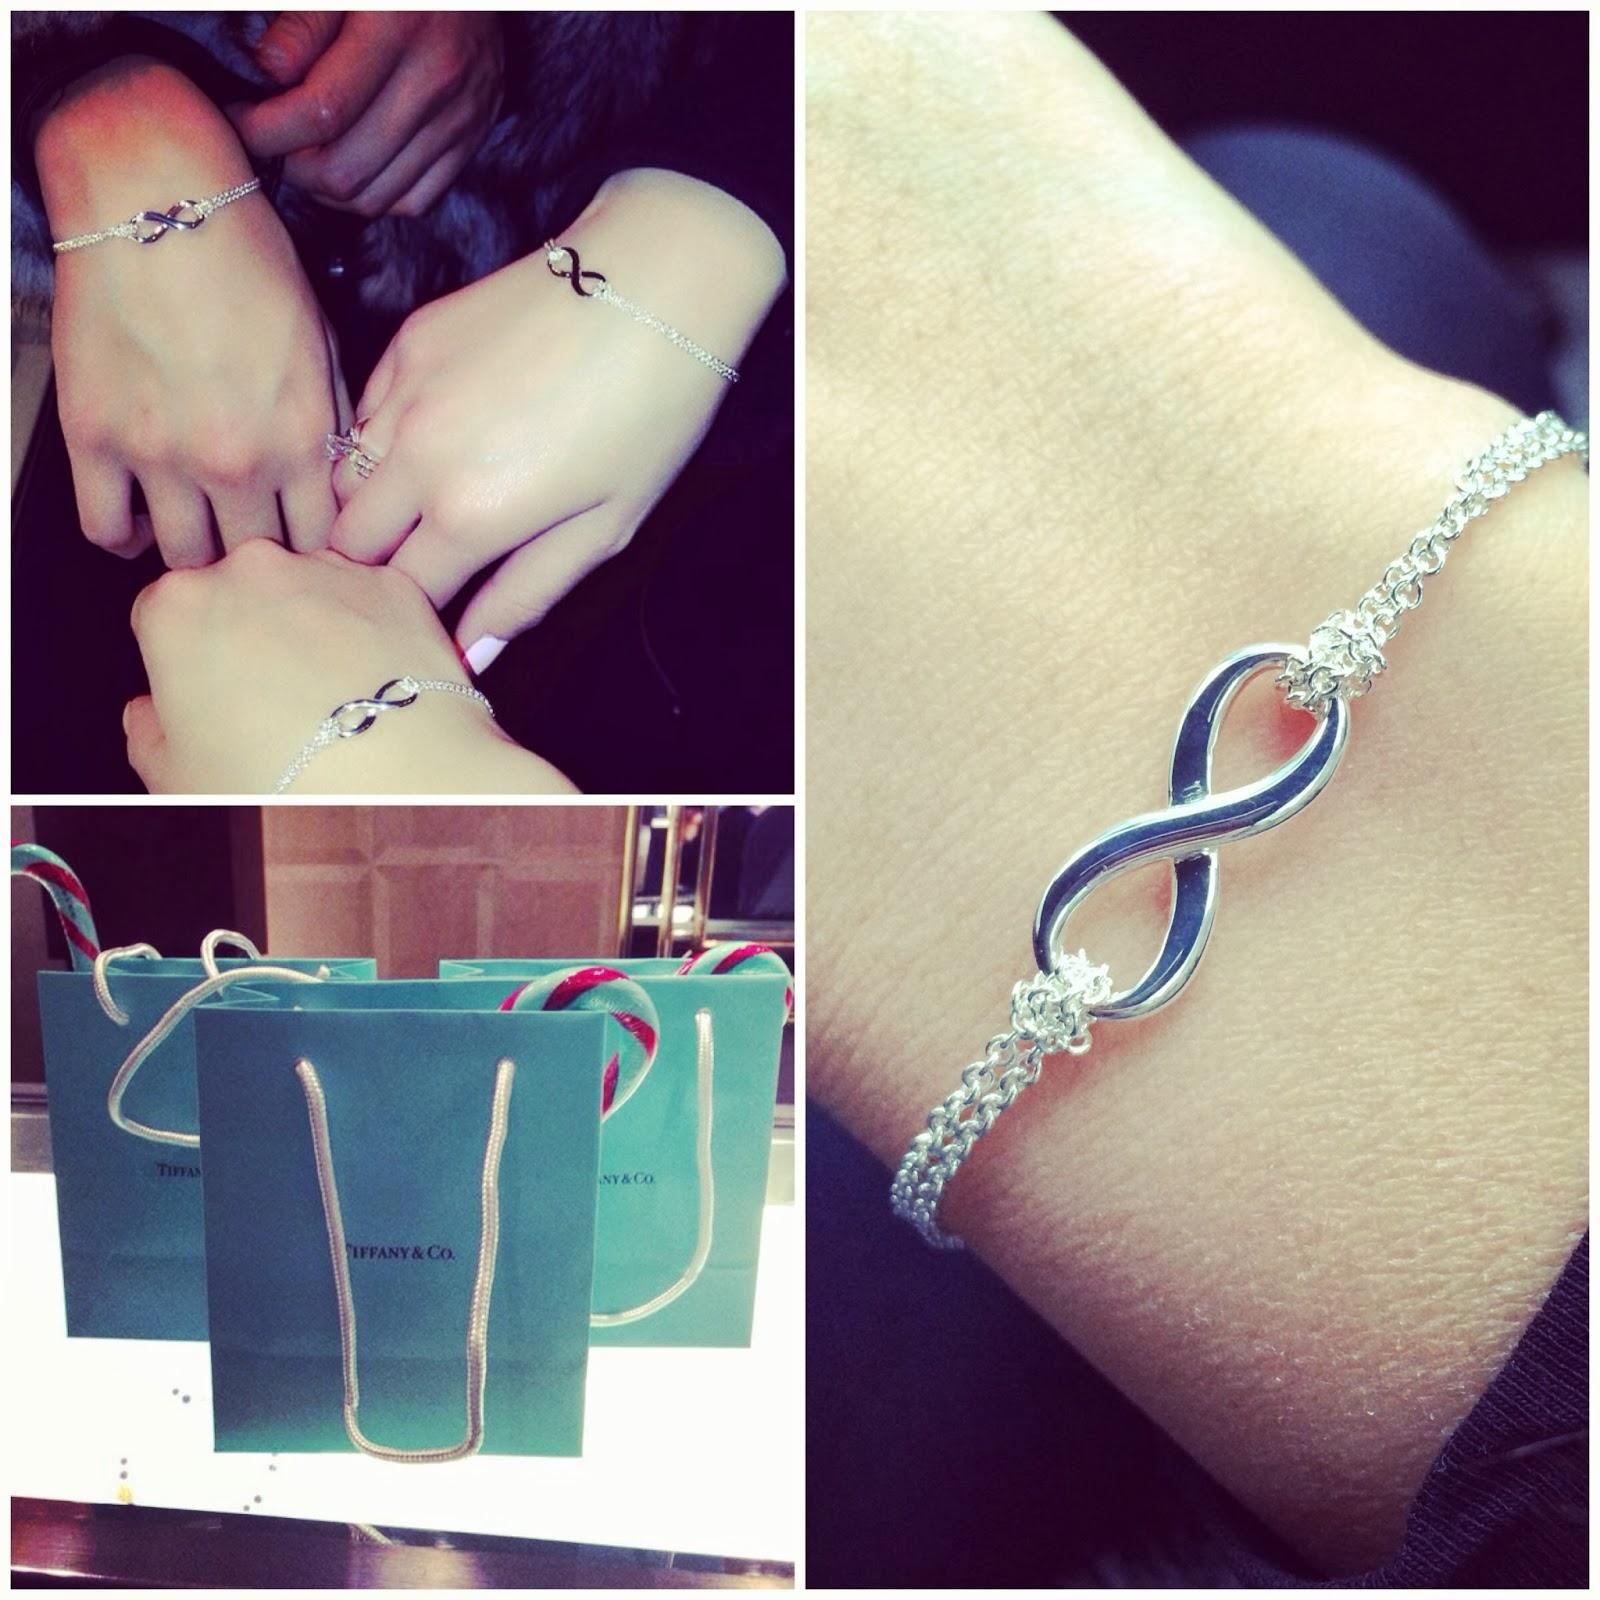 Matching Infinity Bracelets From Tiffany Fashionably Broke I M Back The Dead P